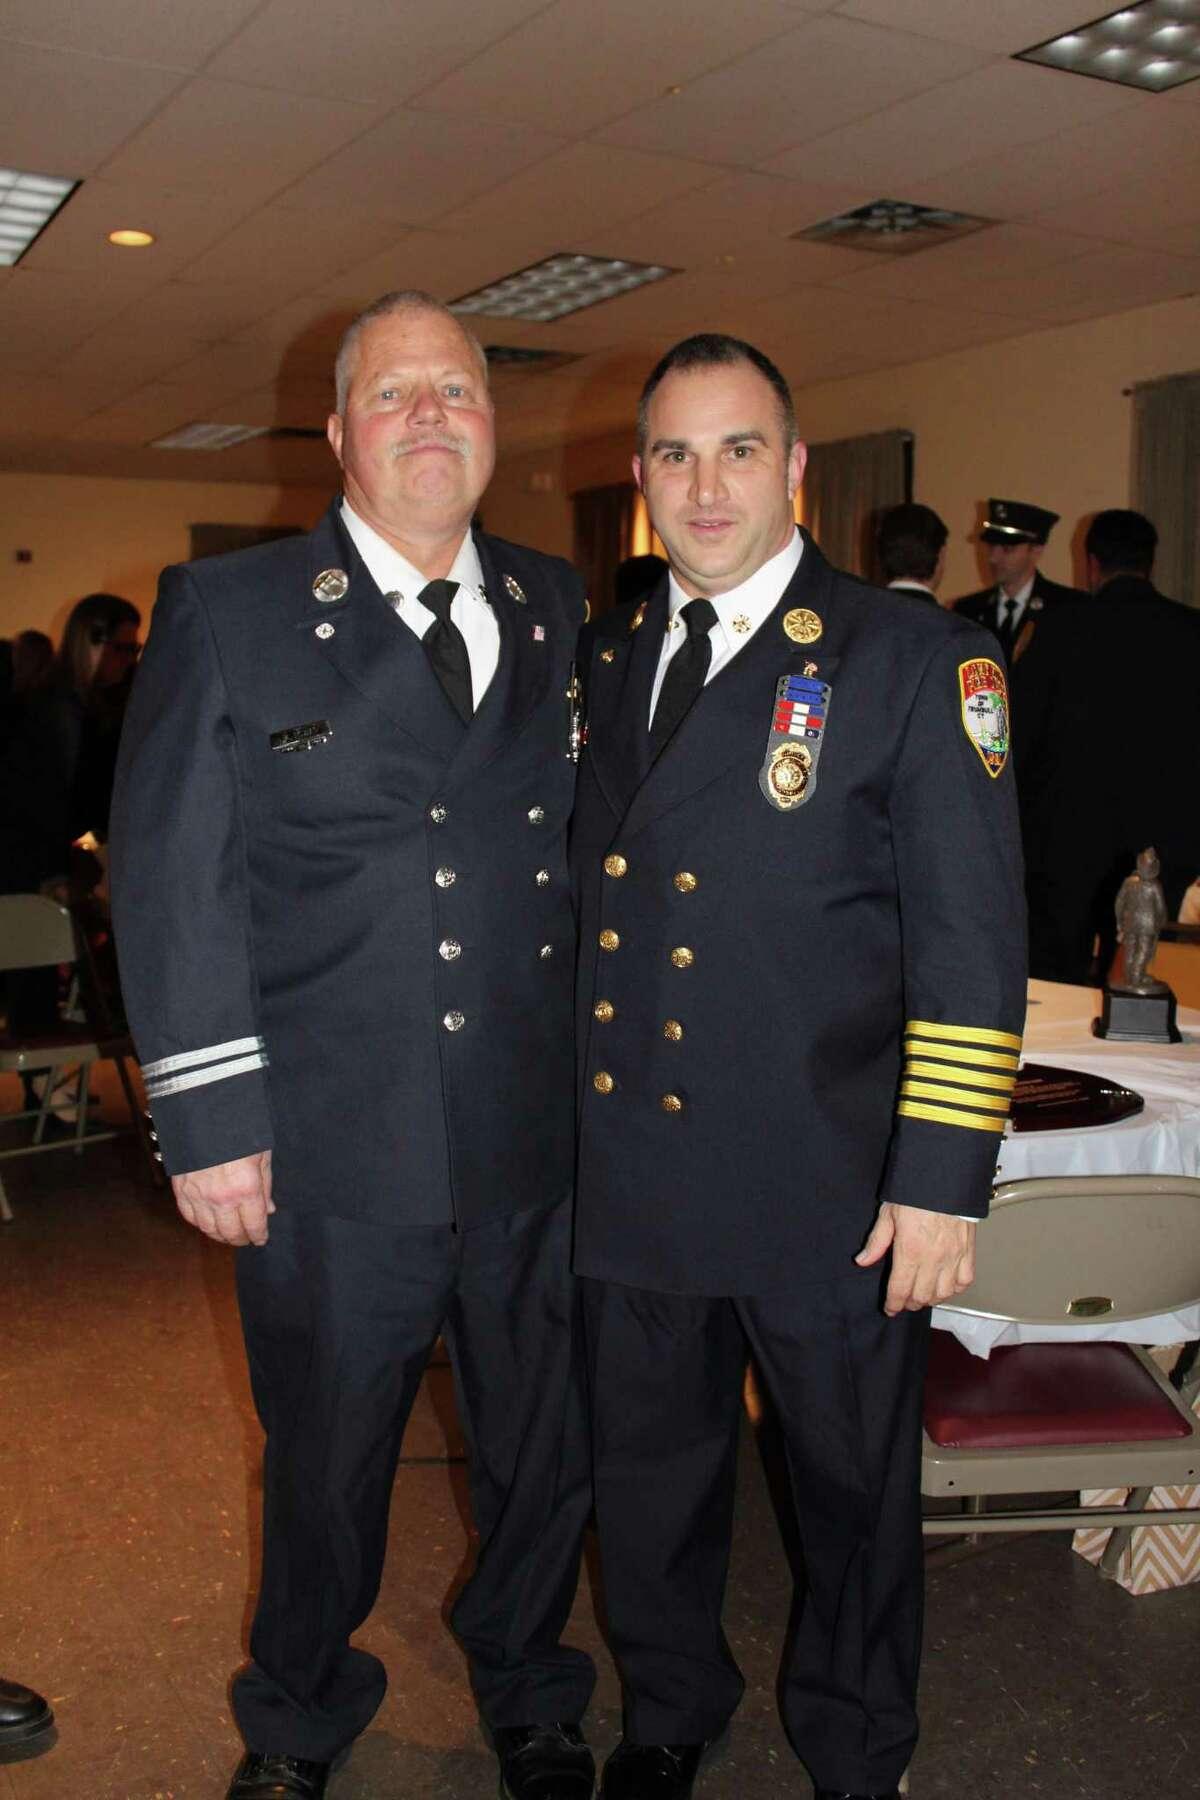 Retired Captain Mike Rowan andChief Alex Rauso